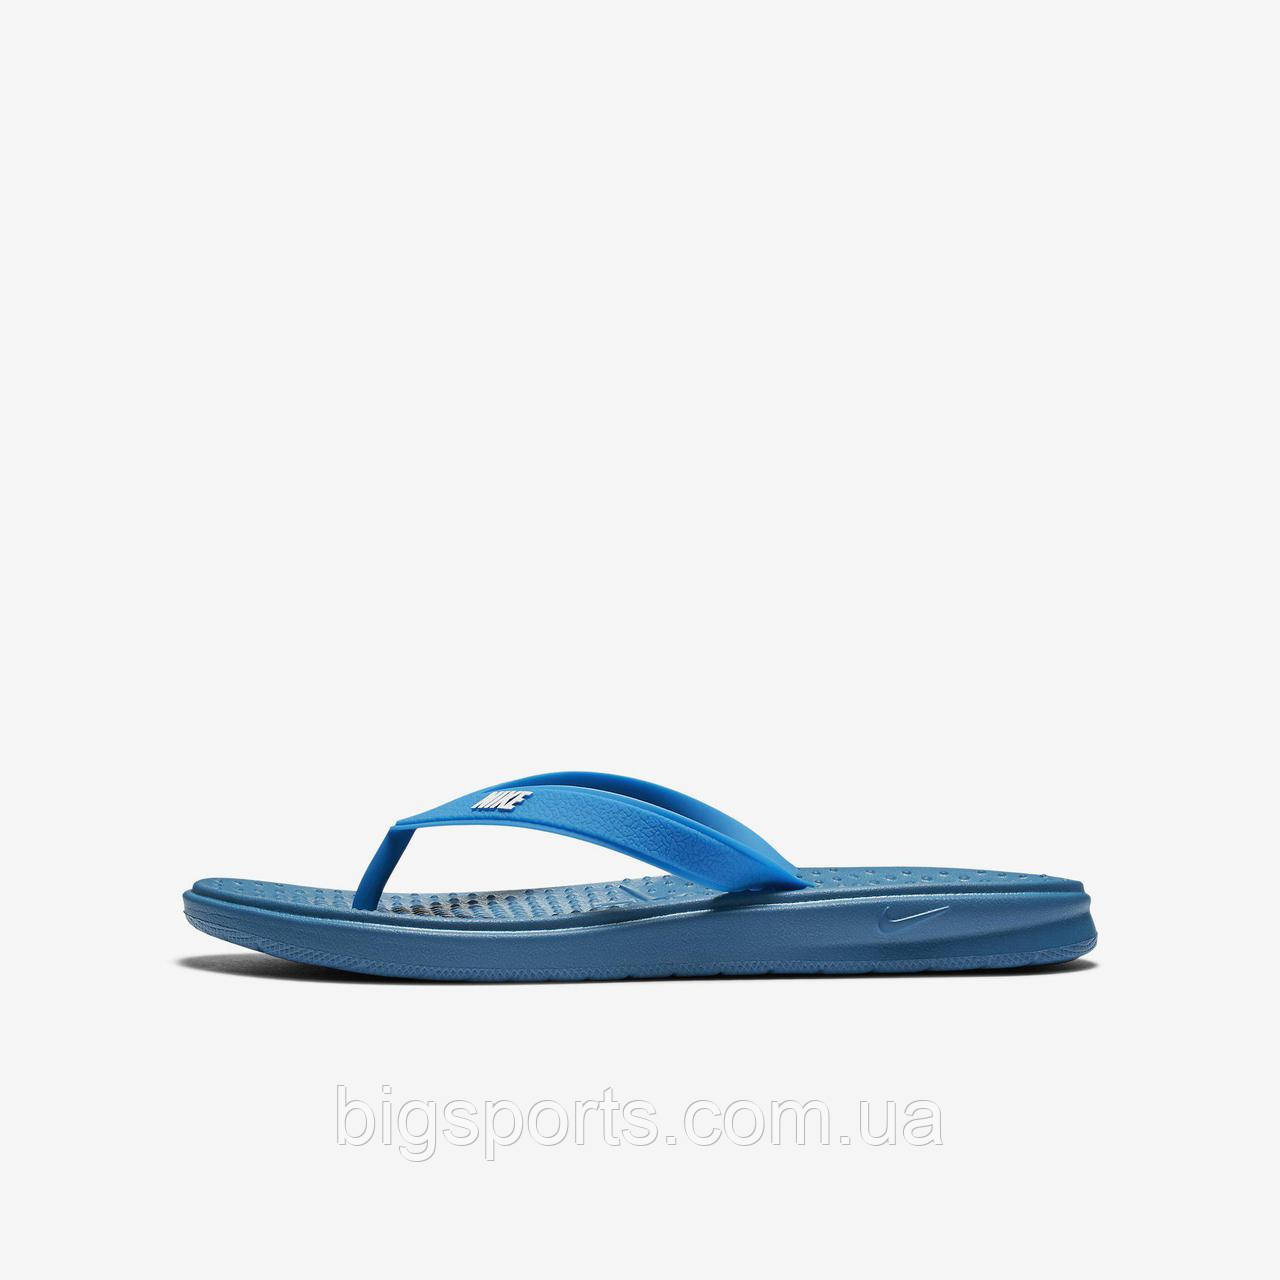 Nike Solay Thong (GS/PS) 882827-400 882827-400 blmJNoM